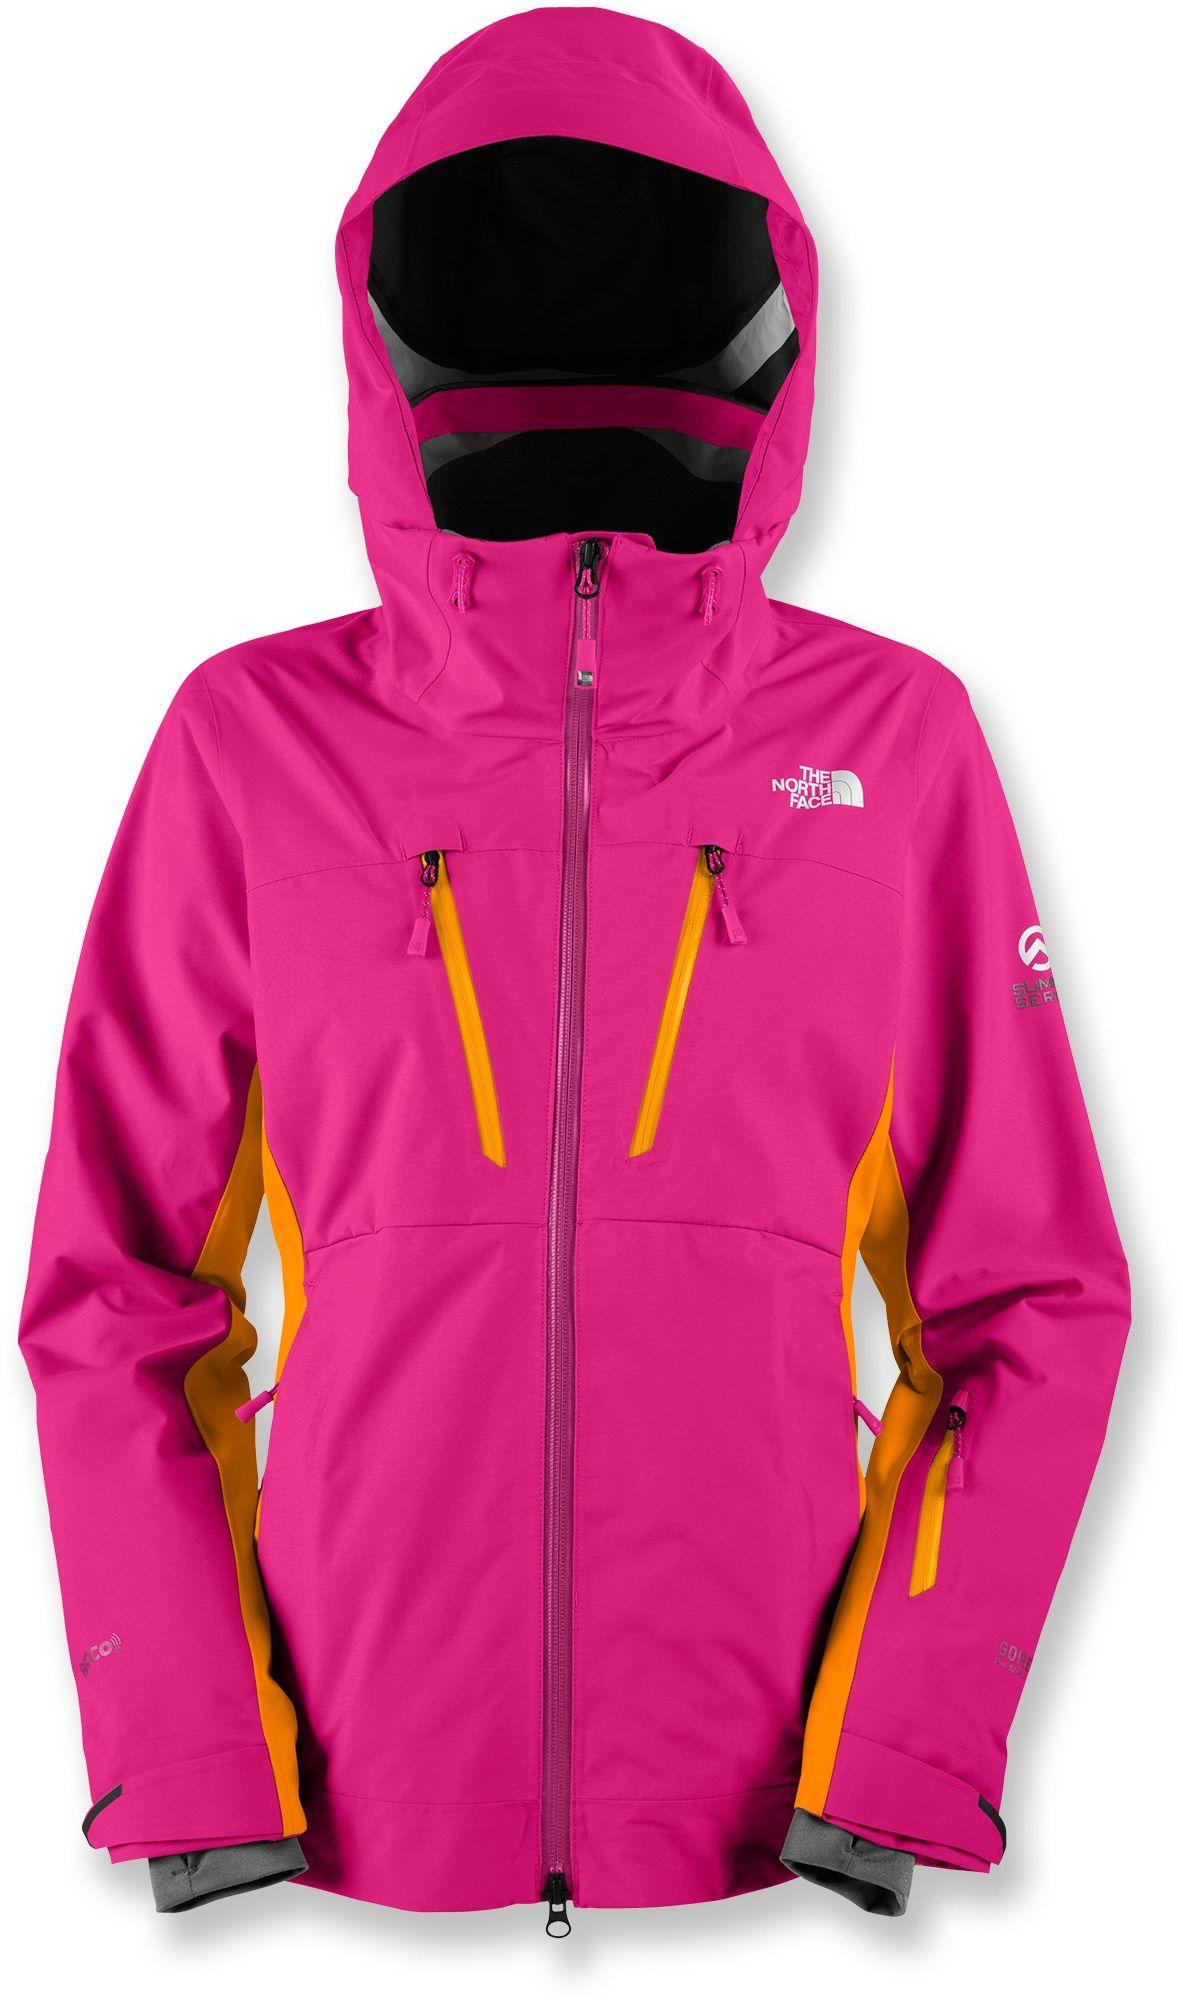 Ski Season The North Face Free Thinker Shell Jacket Women S 2011 Closeout Free Shipping At Rei Outlet Jackets For Women Shop Womens Jackets Ski Jacket [ 2000 x 1183 Pixel ]